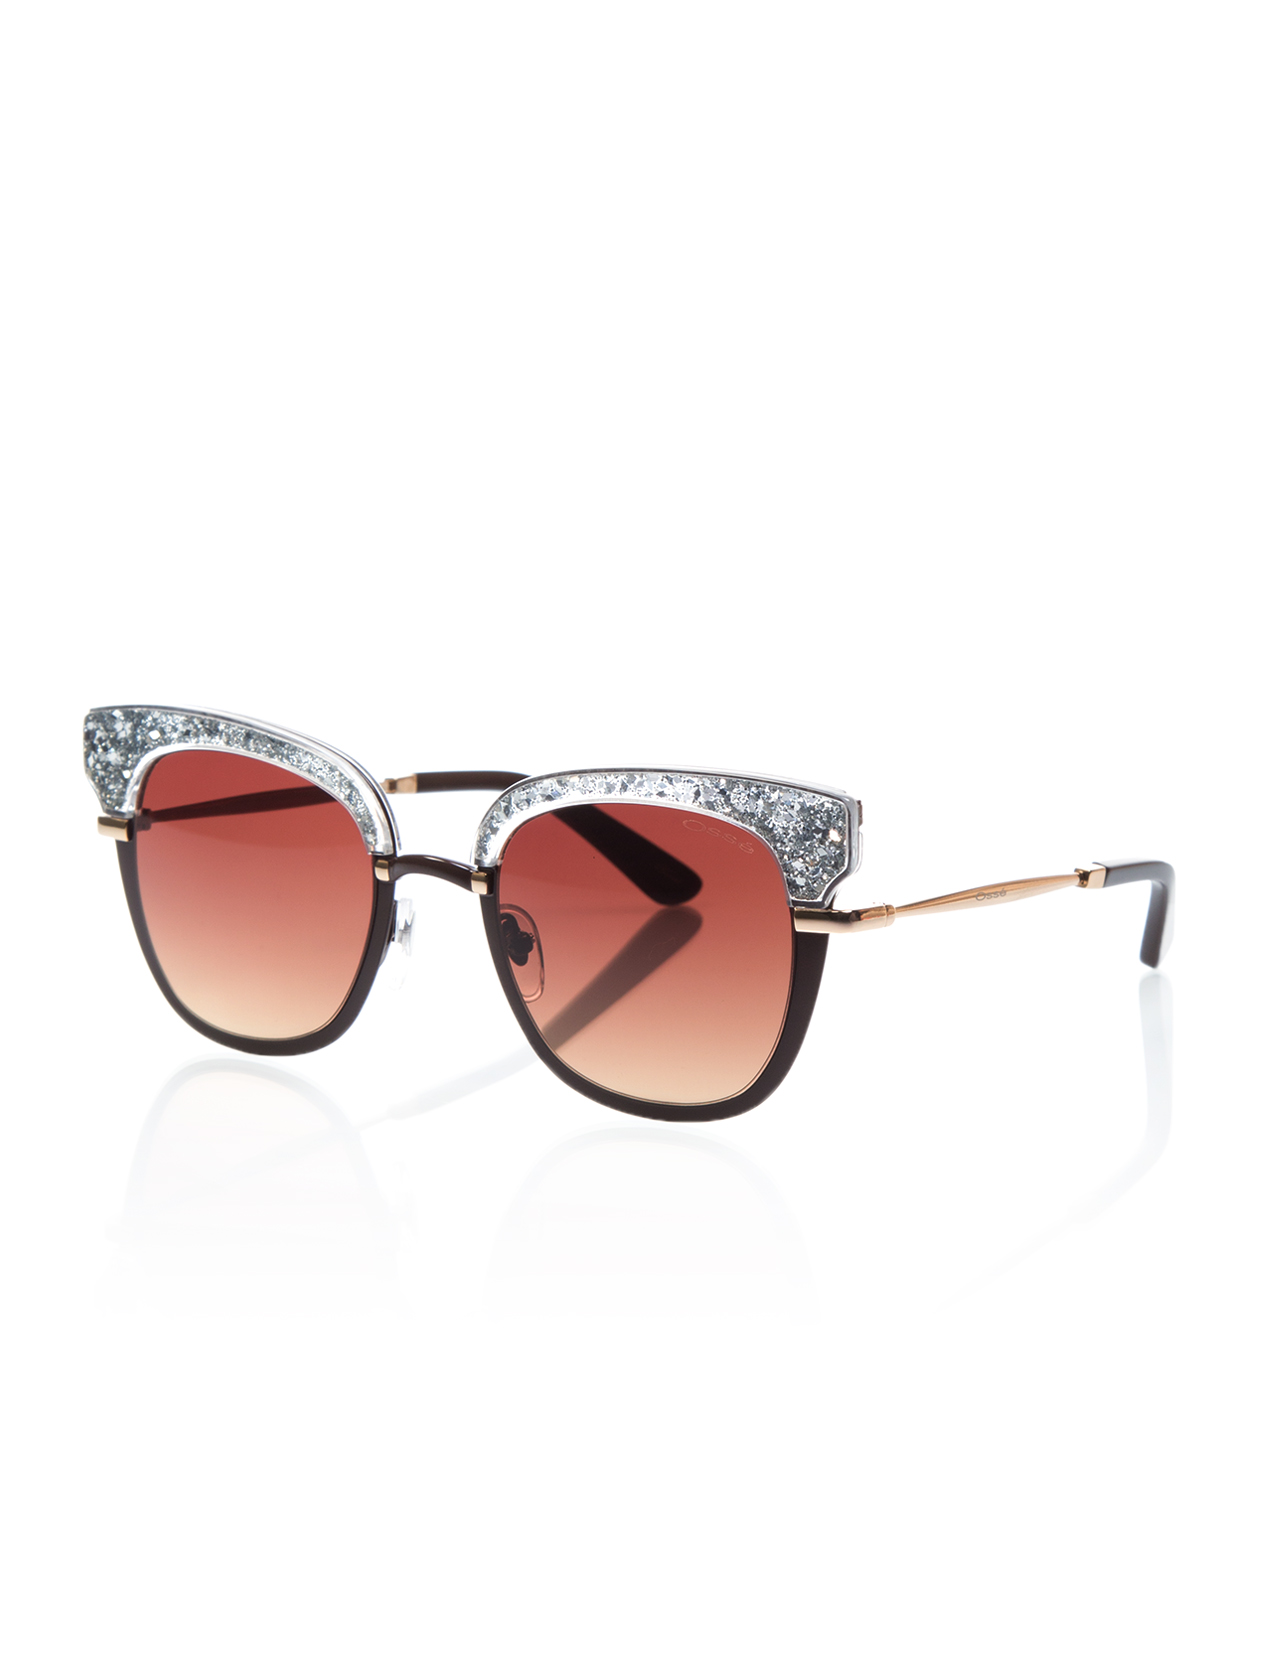 Women's sunglasses os 2575 04 metal Brown organic square square 51-22-140 osse